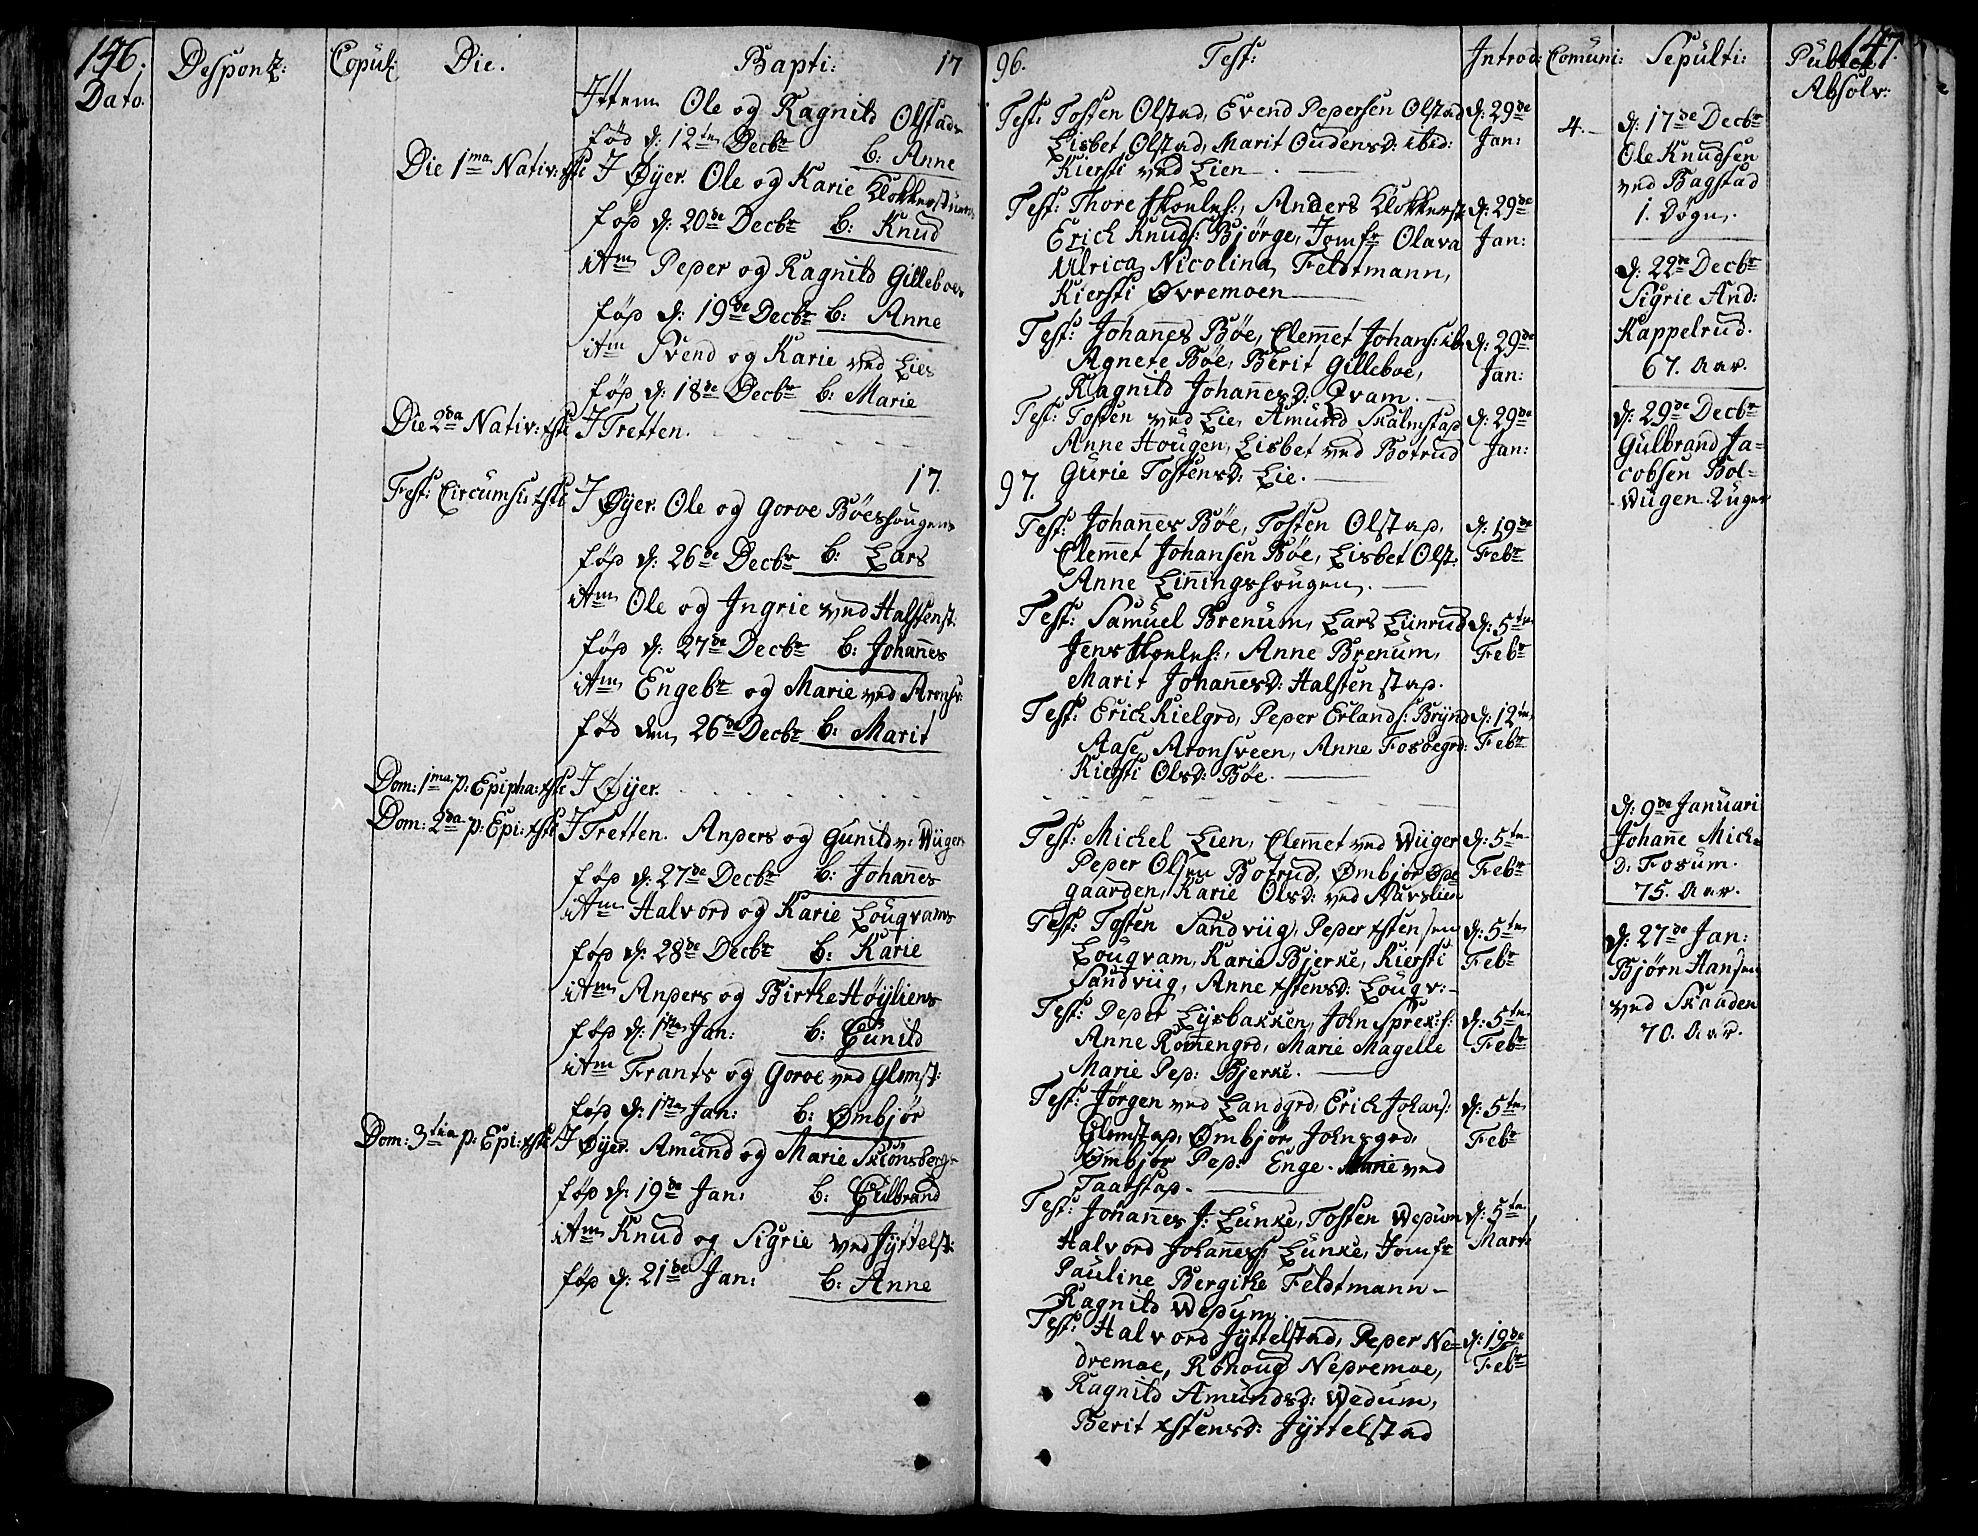 SAH, Øyer prestekontor, Ministerialbok nr. 3, 1784-1824, s. 146-147